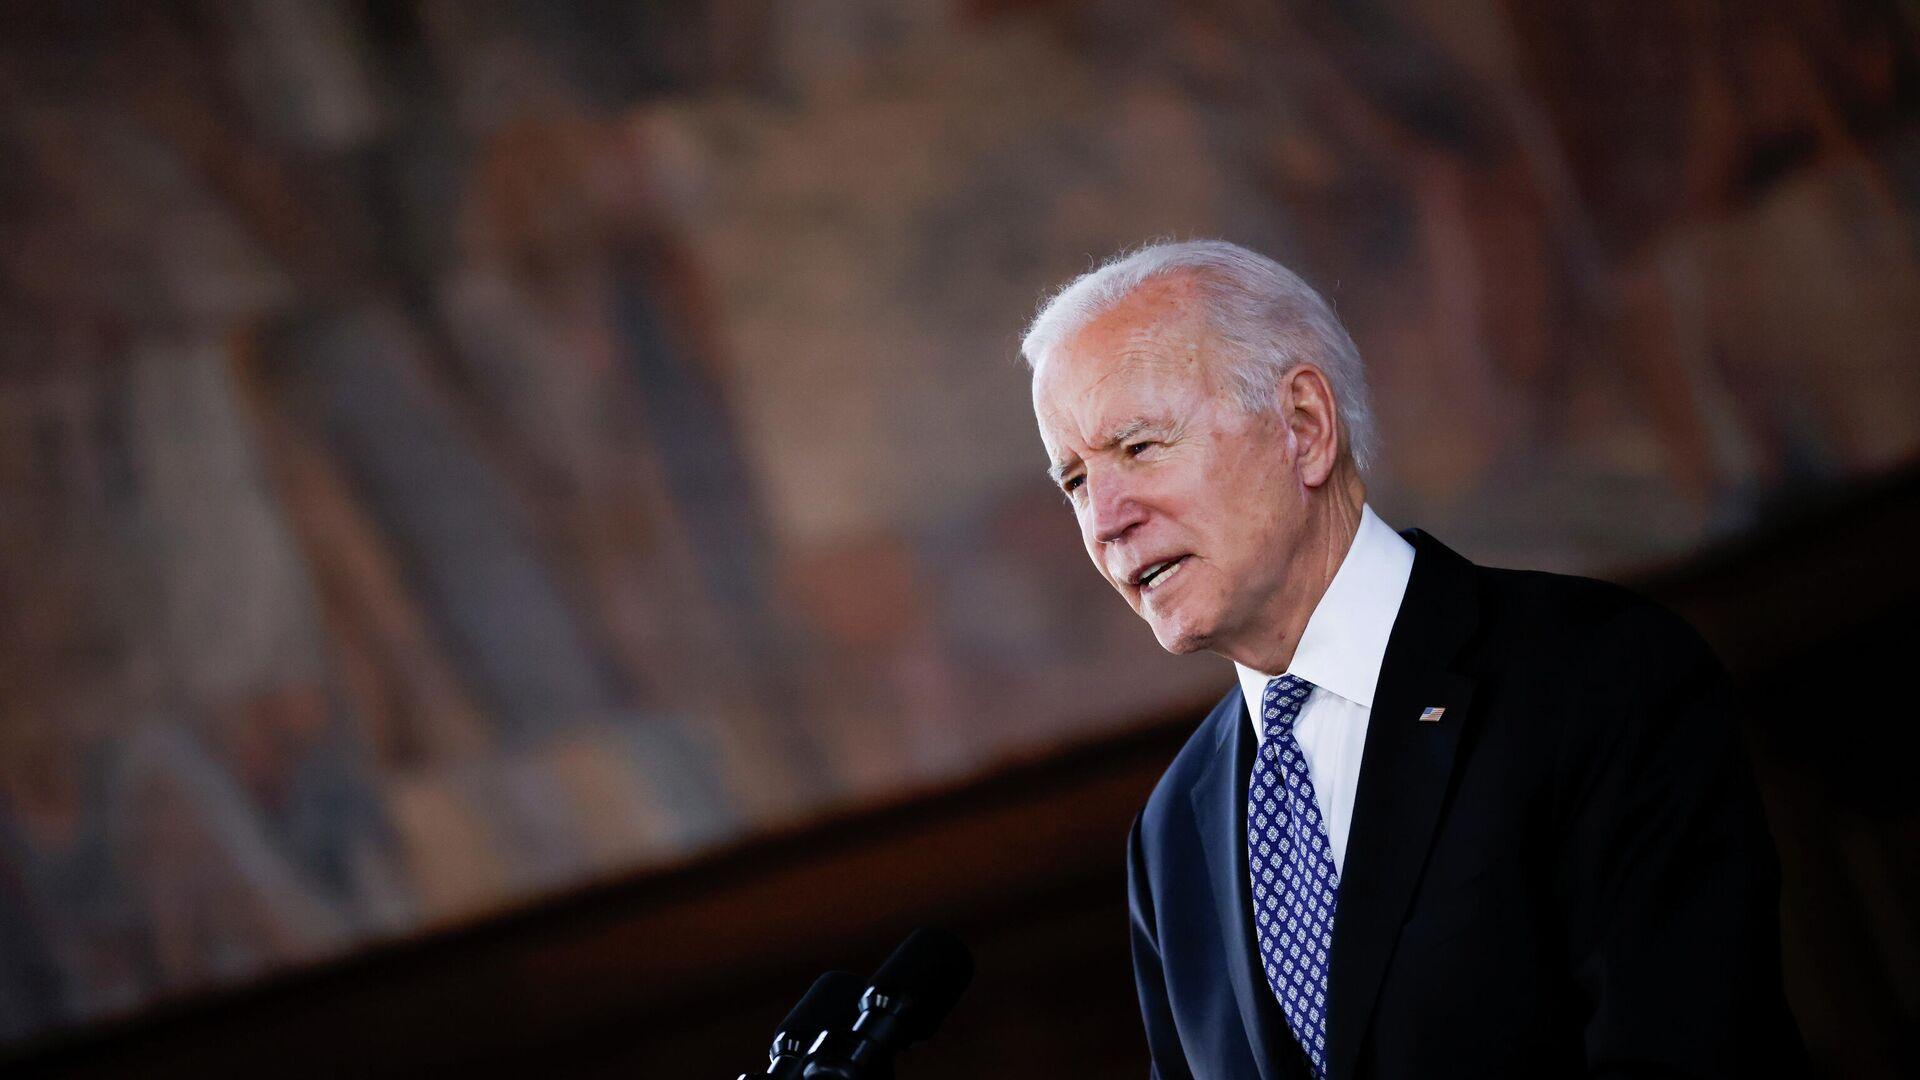 Joe Biden, presidente de EEUU - Sputnik Mundo, 1920, 21.03.2021